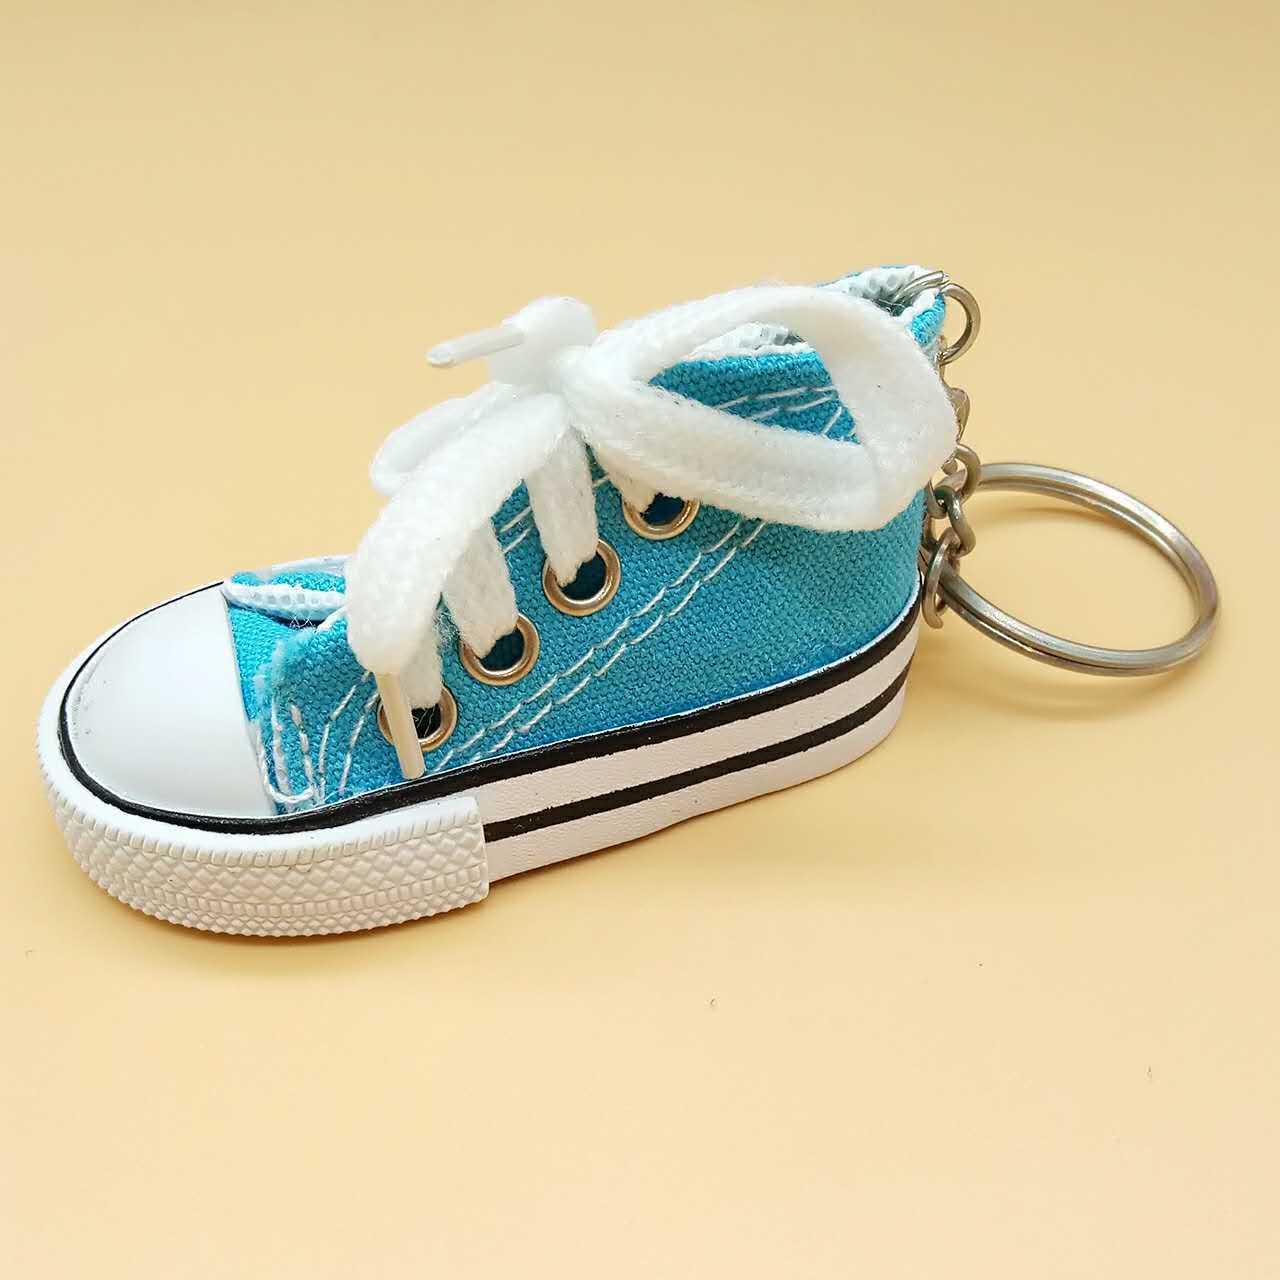 Creative canvas shoes pendant keychain wholesale Nihaojewelry NHYOU422319